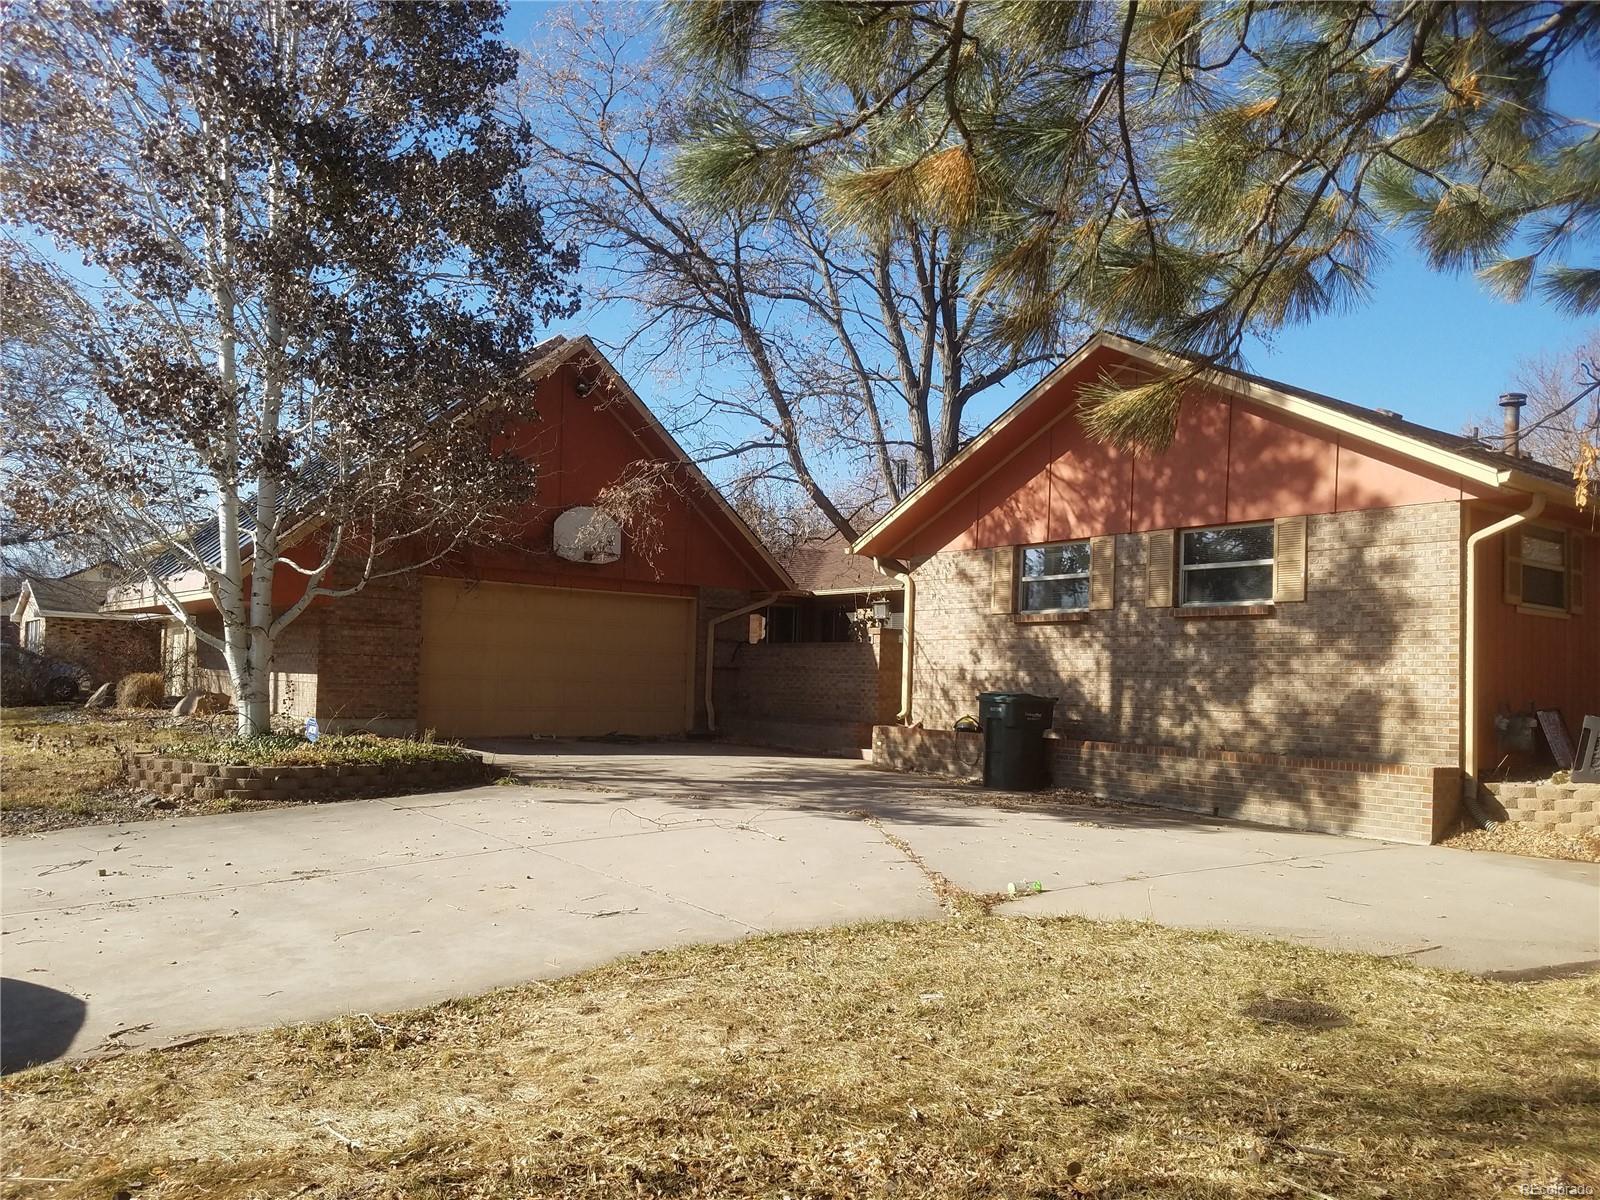 14605 W 58th Avenue, Arvada, CO 80002 - Arvada, CO real estate listing